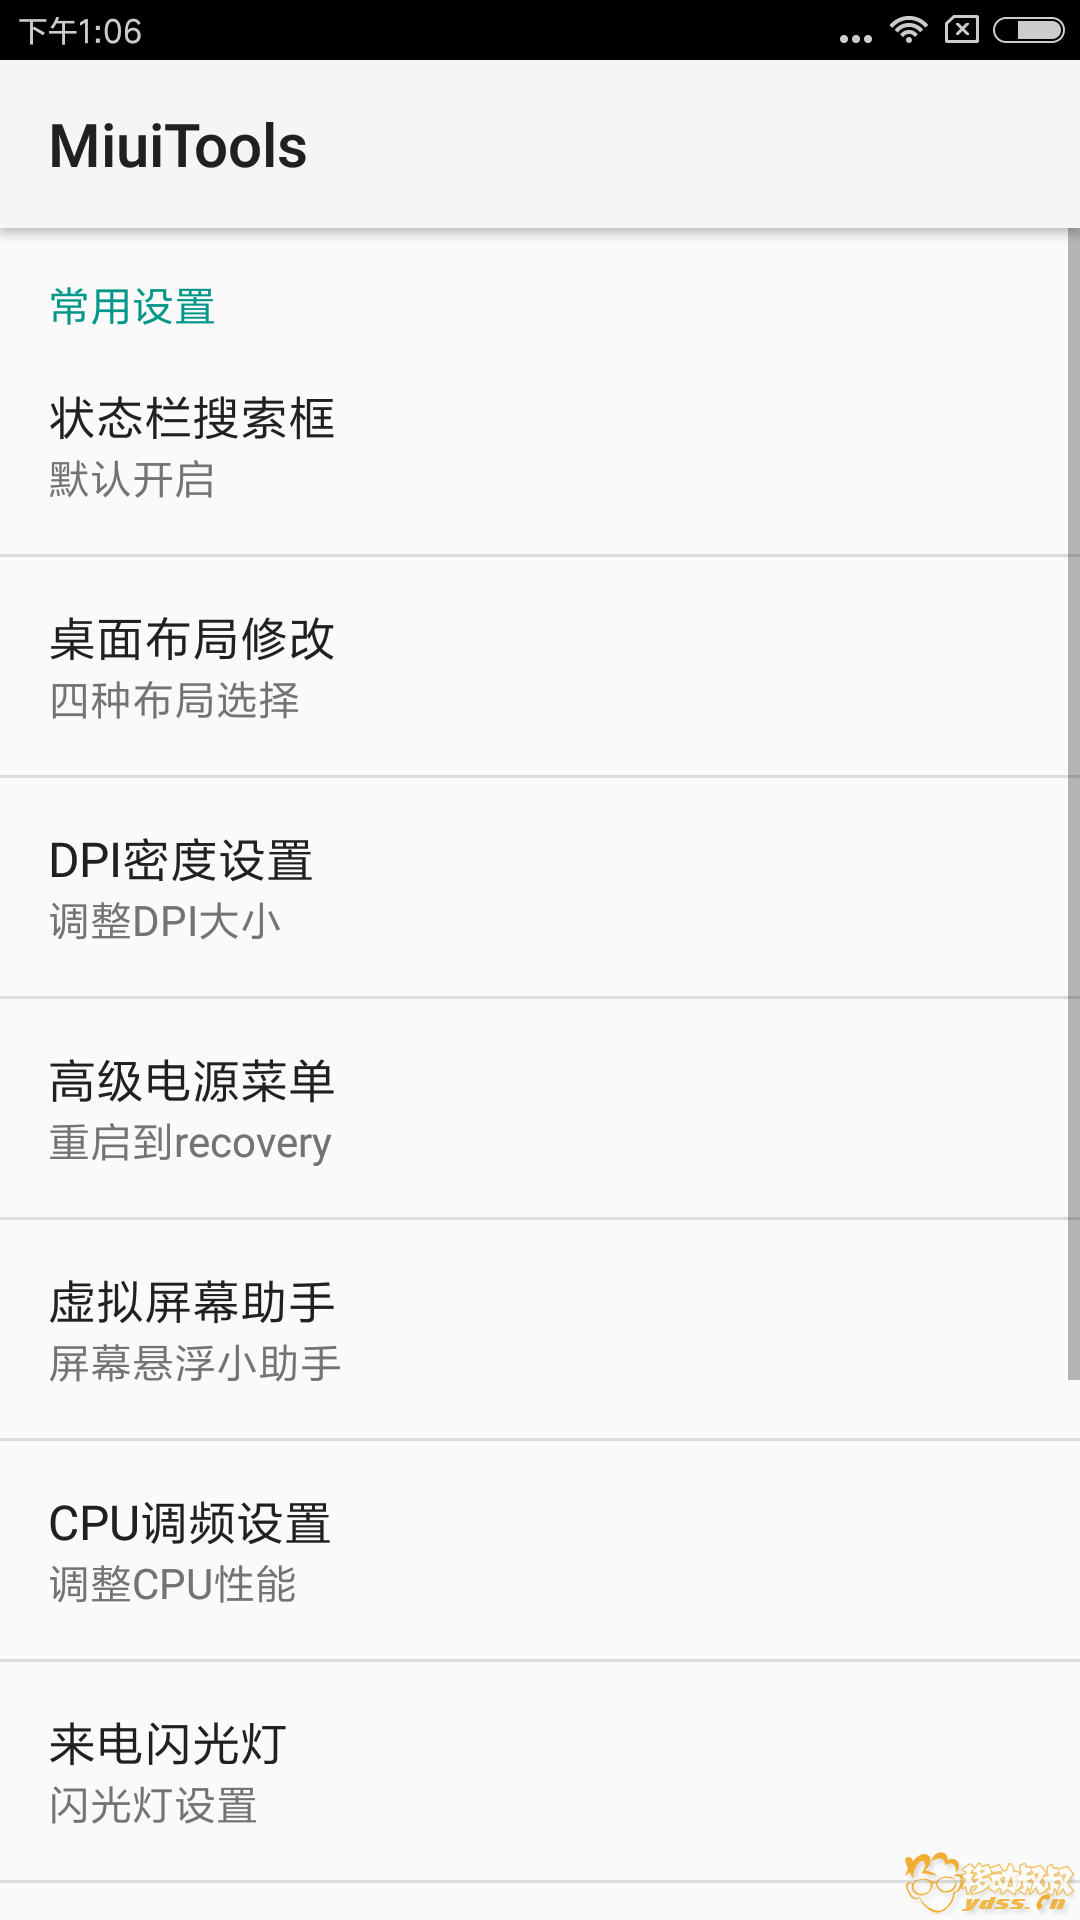 Screenshot_2017-10-22-13-06-41-187_com.anzhi.hwsettings.png